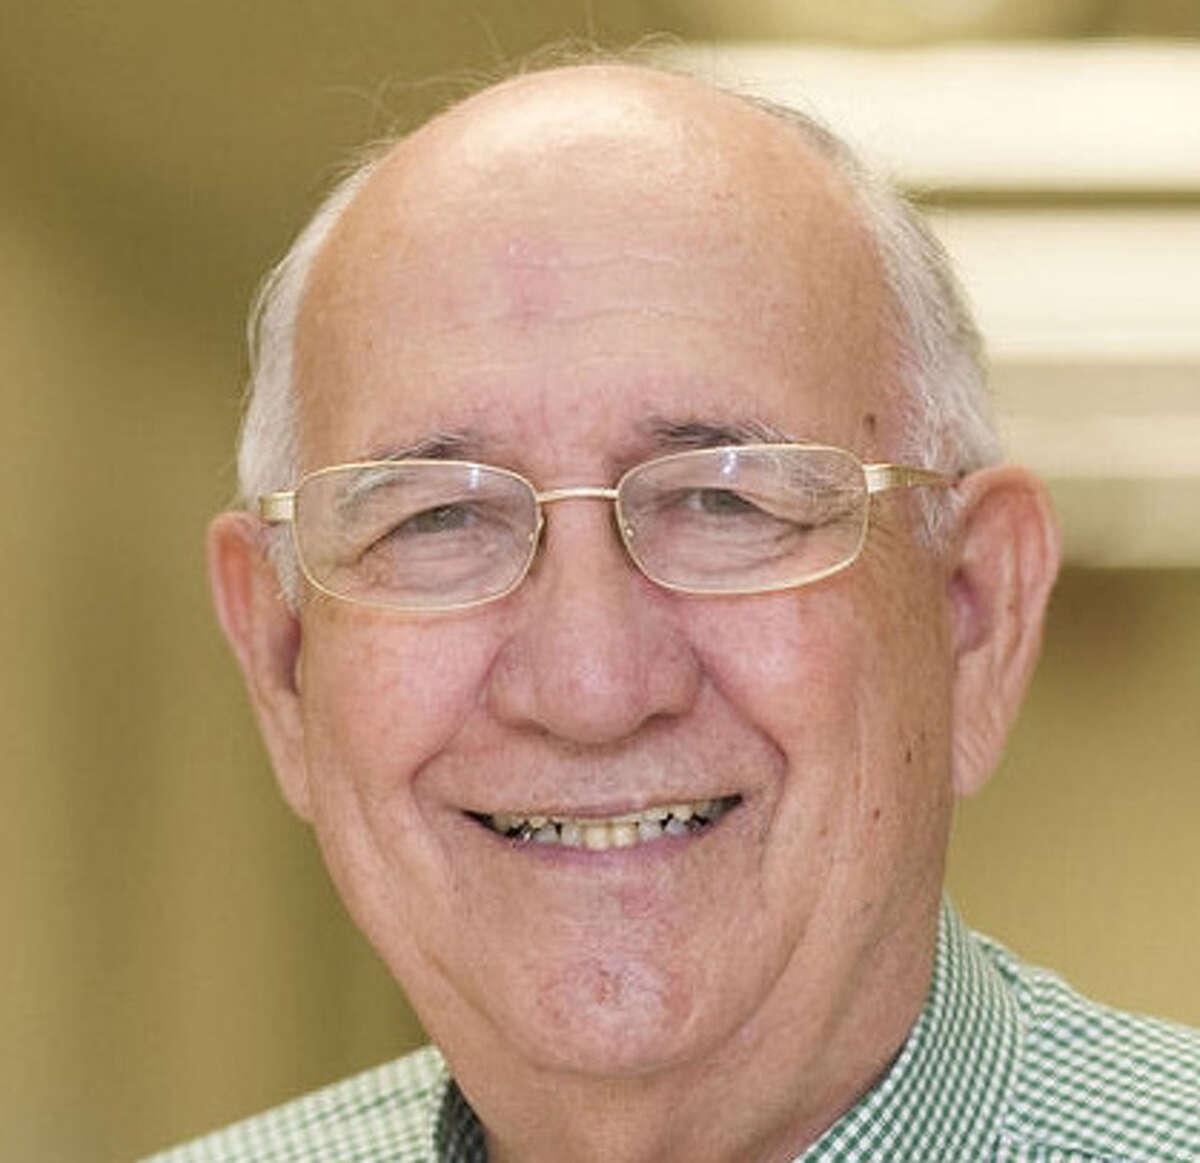 Lino Garcia Jr. is an eighth-generation Tejano and professor emeritus at UTPA.